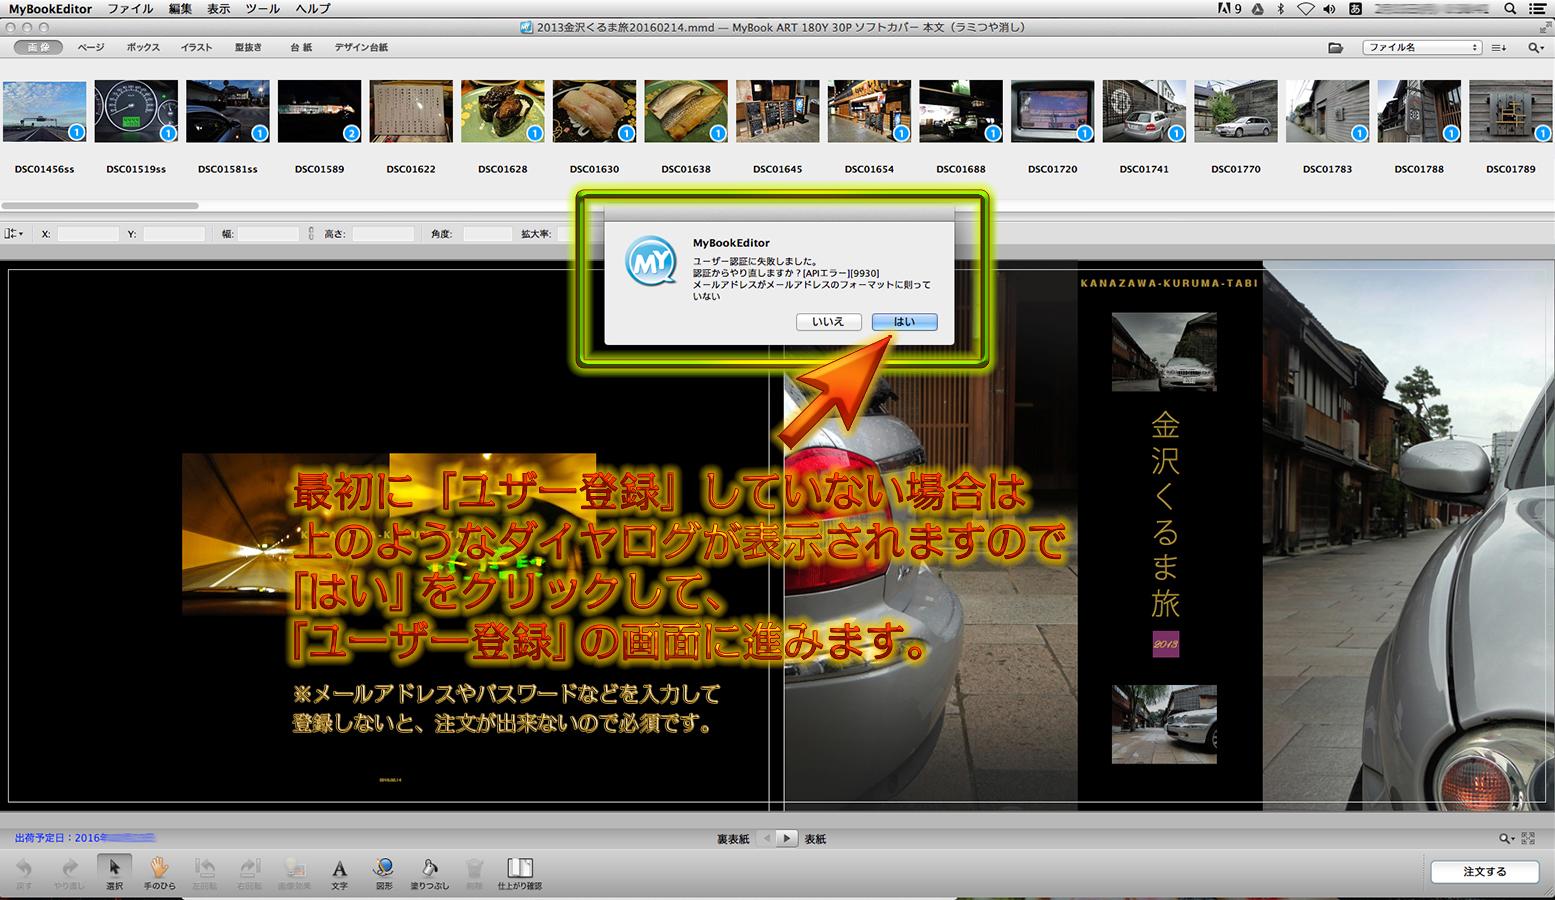 http://moritetsu.info/car/img/mb201-2016-02-15-0-38-41.jpg